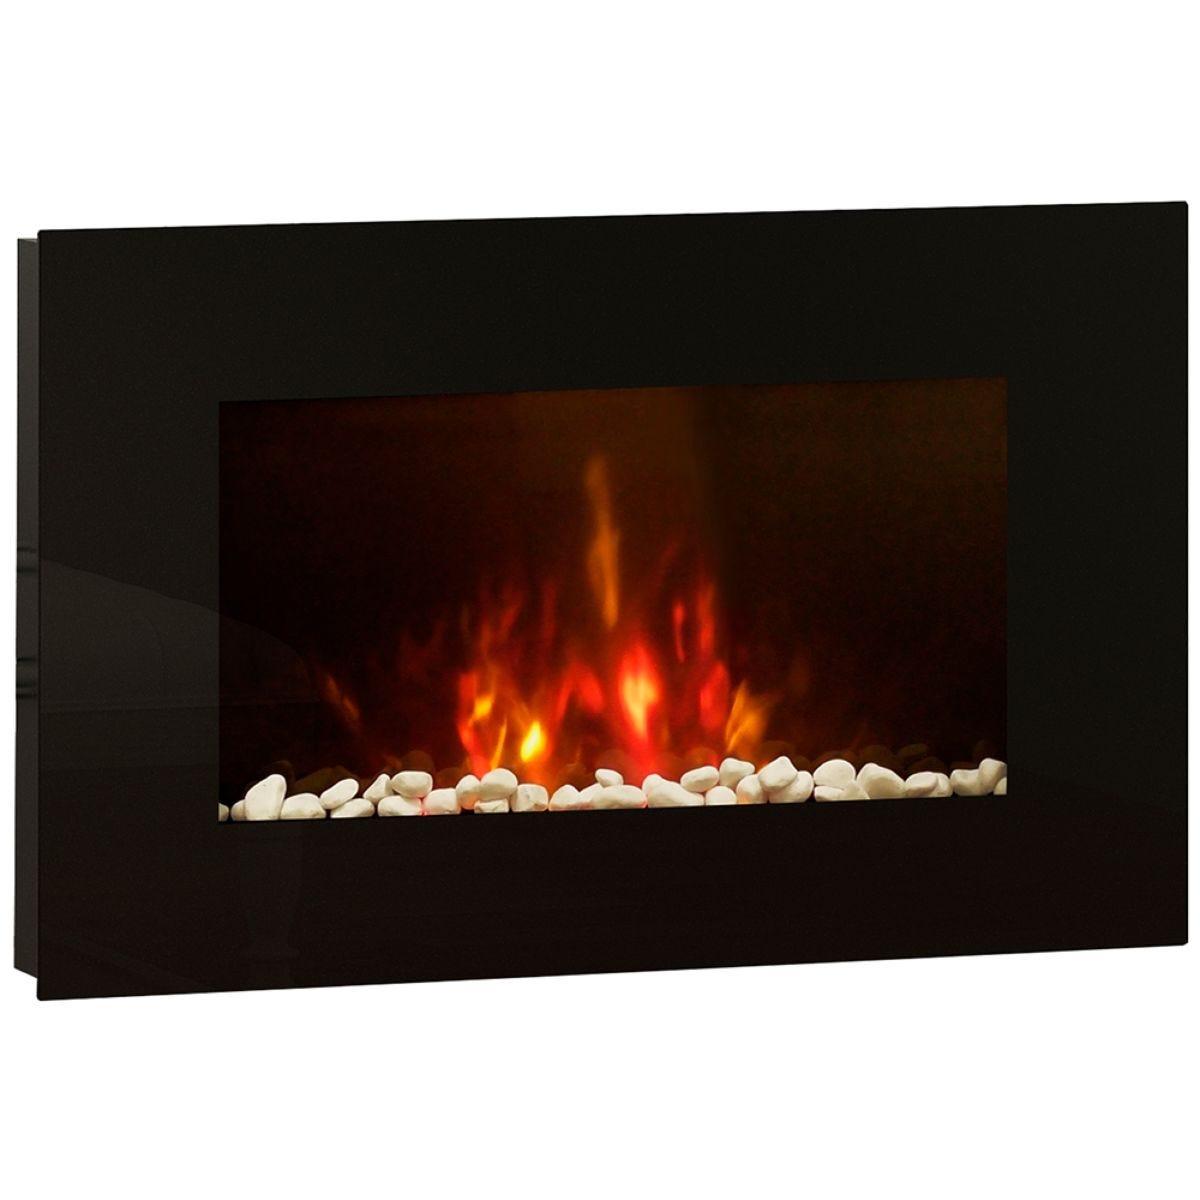 BeModern Azonto Electric Fireplace - Black Glass